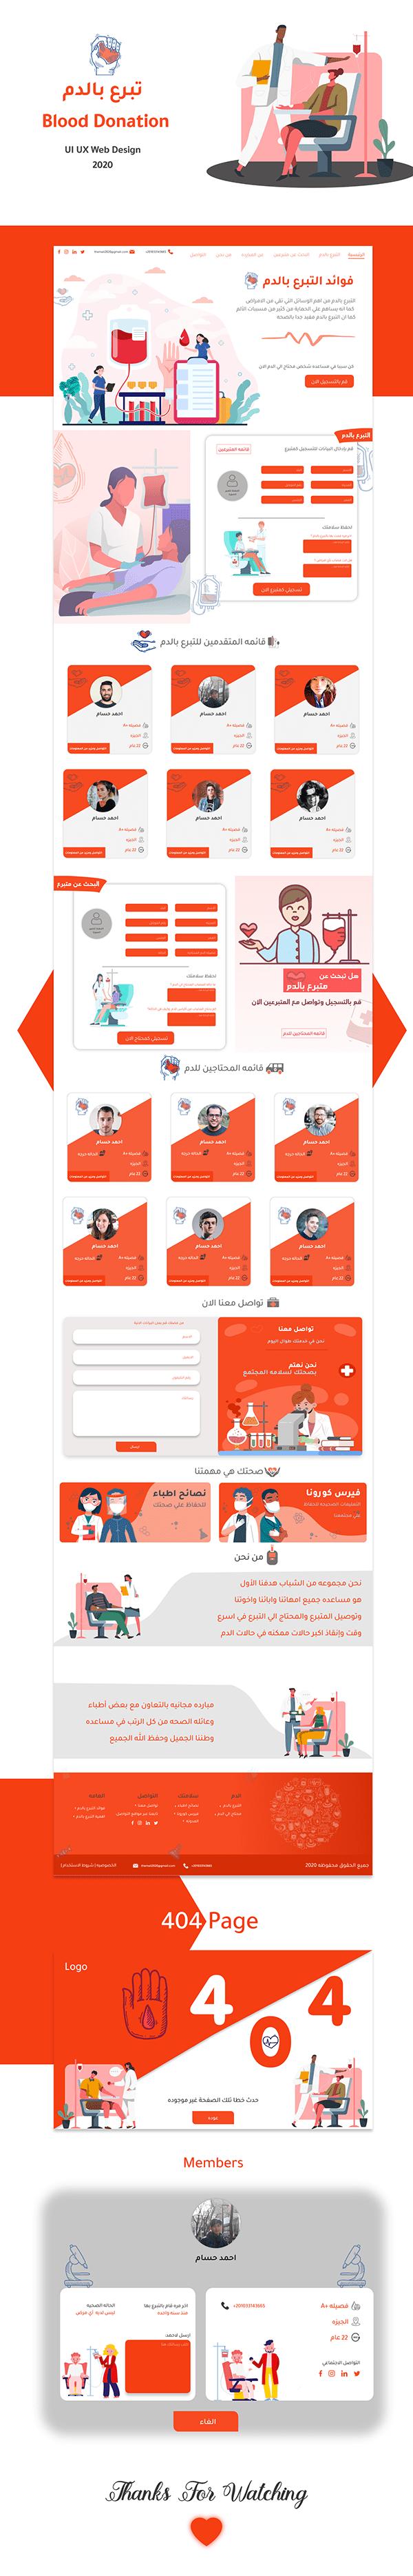 Blood Donation Website | UI/UX